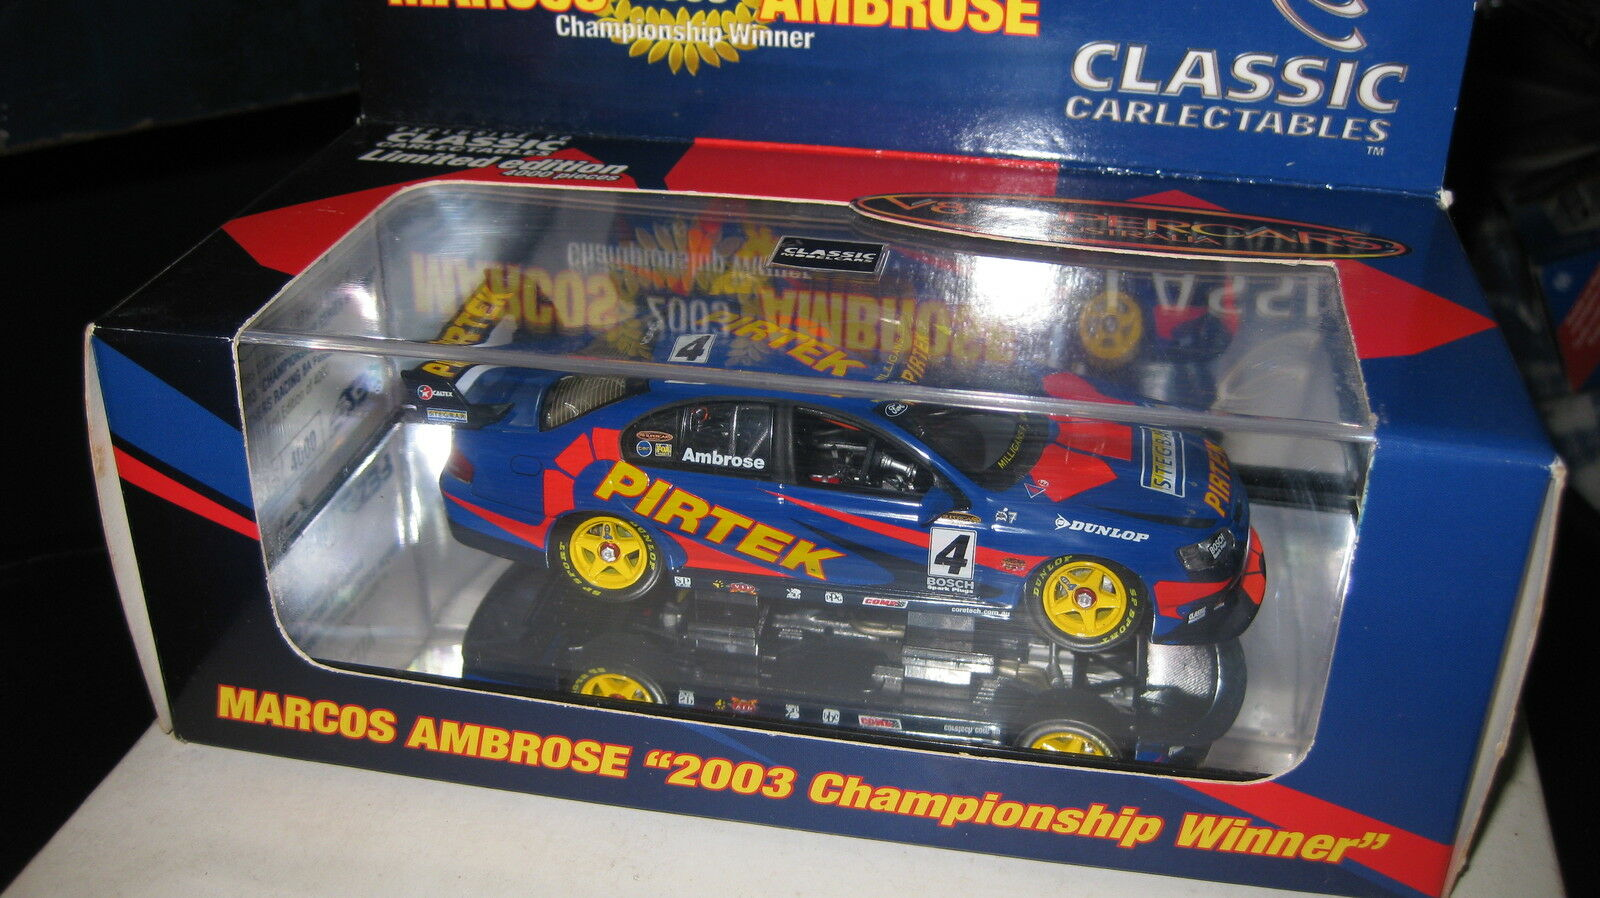 CLASSIC1 43 MARCOS AMBpink SBR PIRTEK BA FALCON 2003 CHAMPIONSHIP WINNER 2004-8